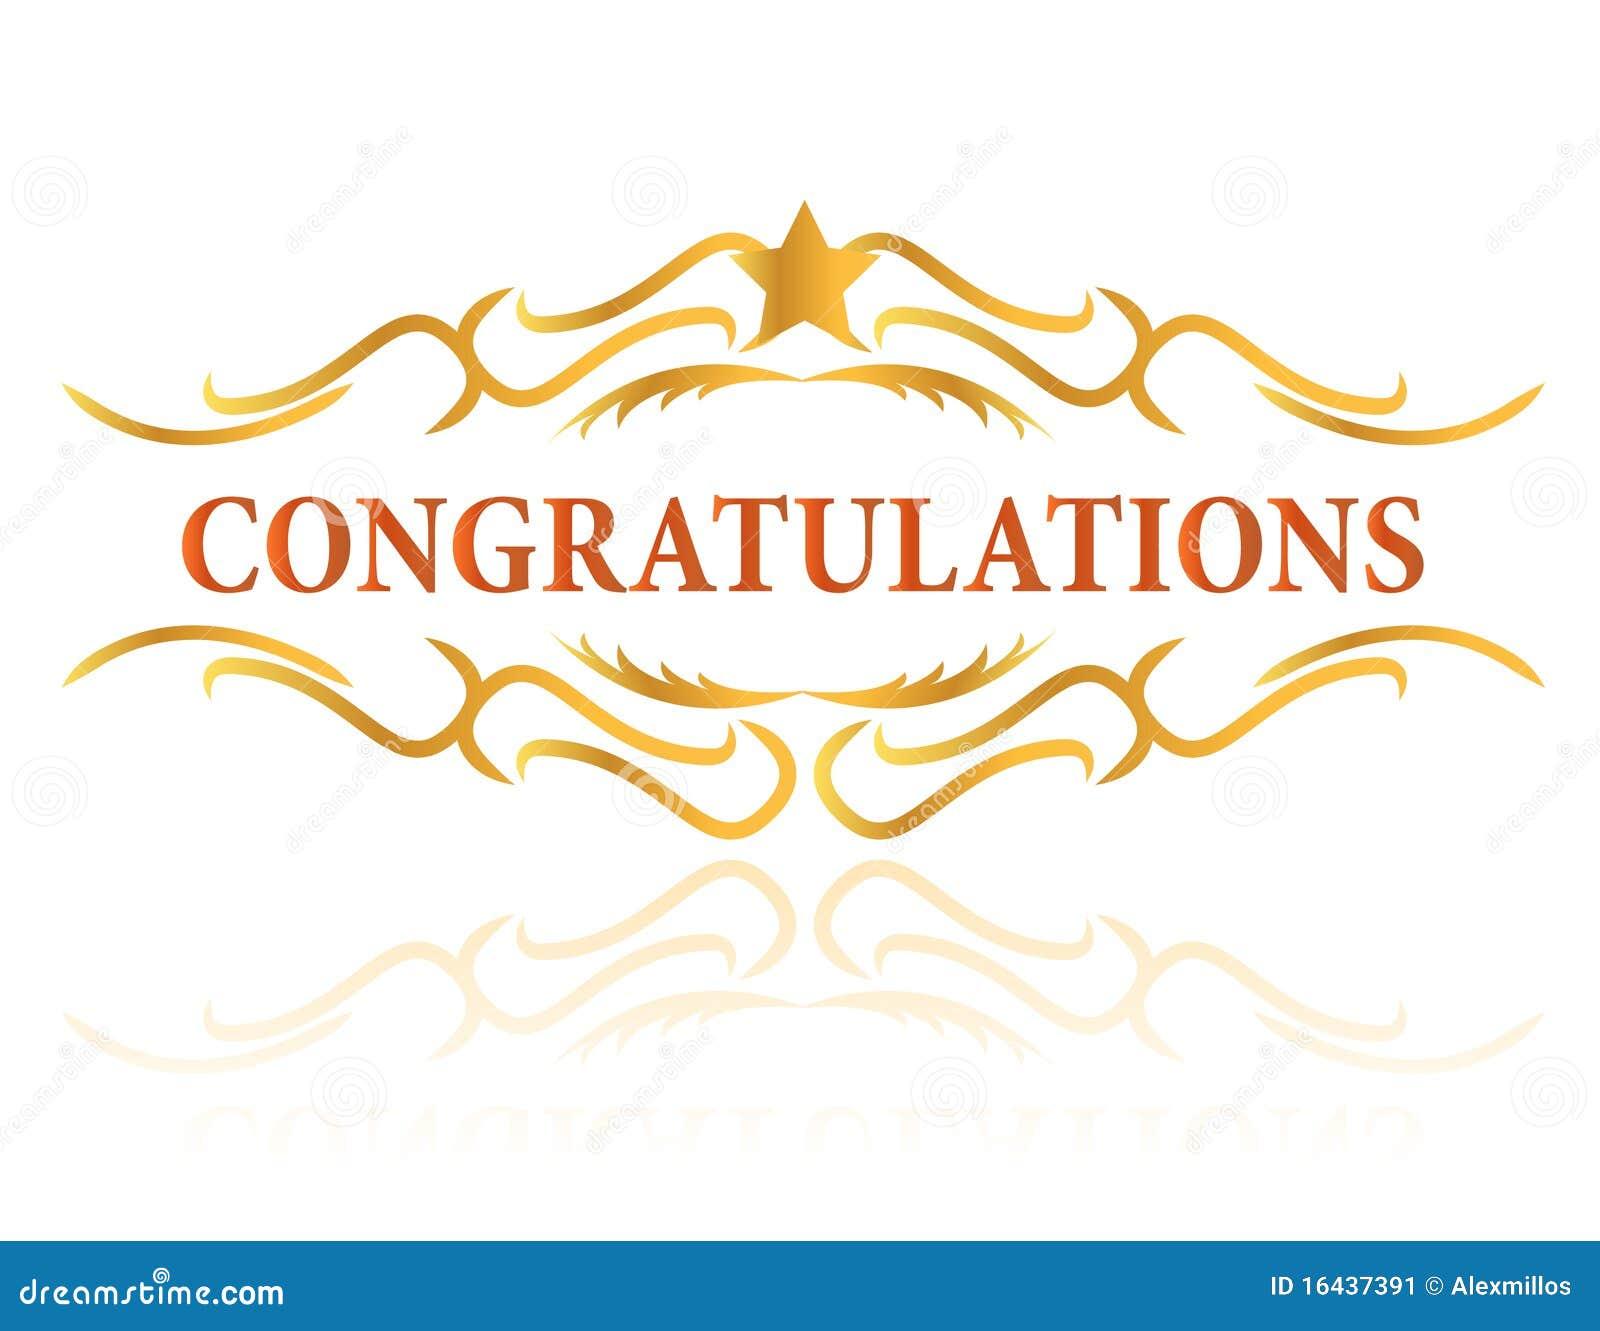 Congratulations Stock Image - Image: 16437391